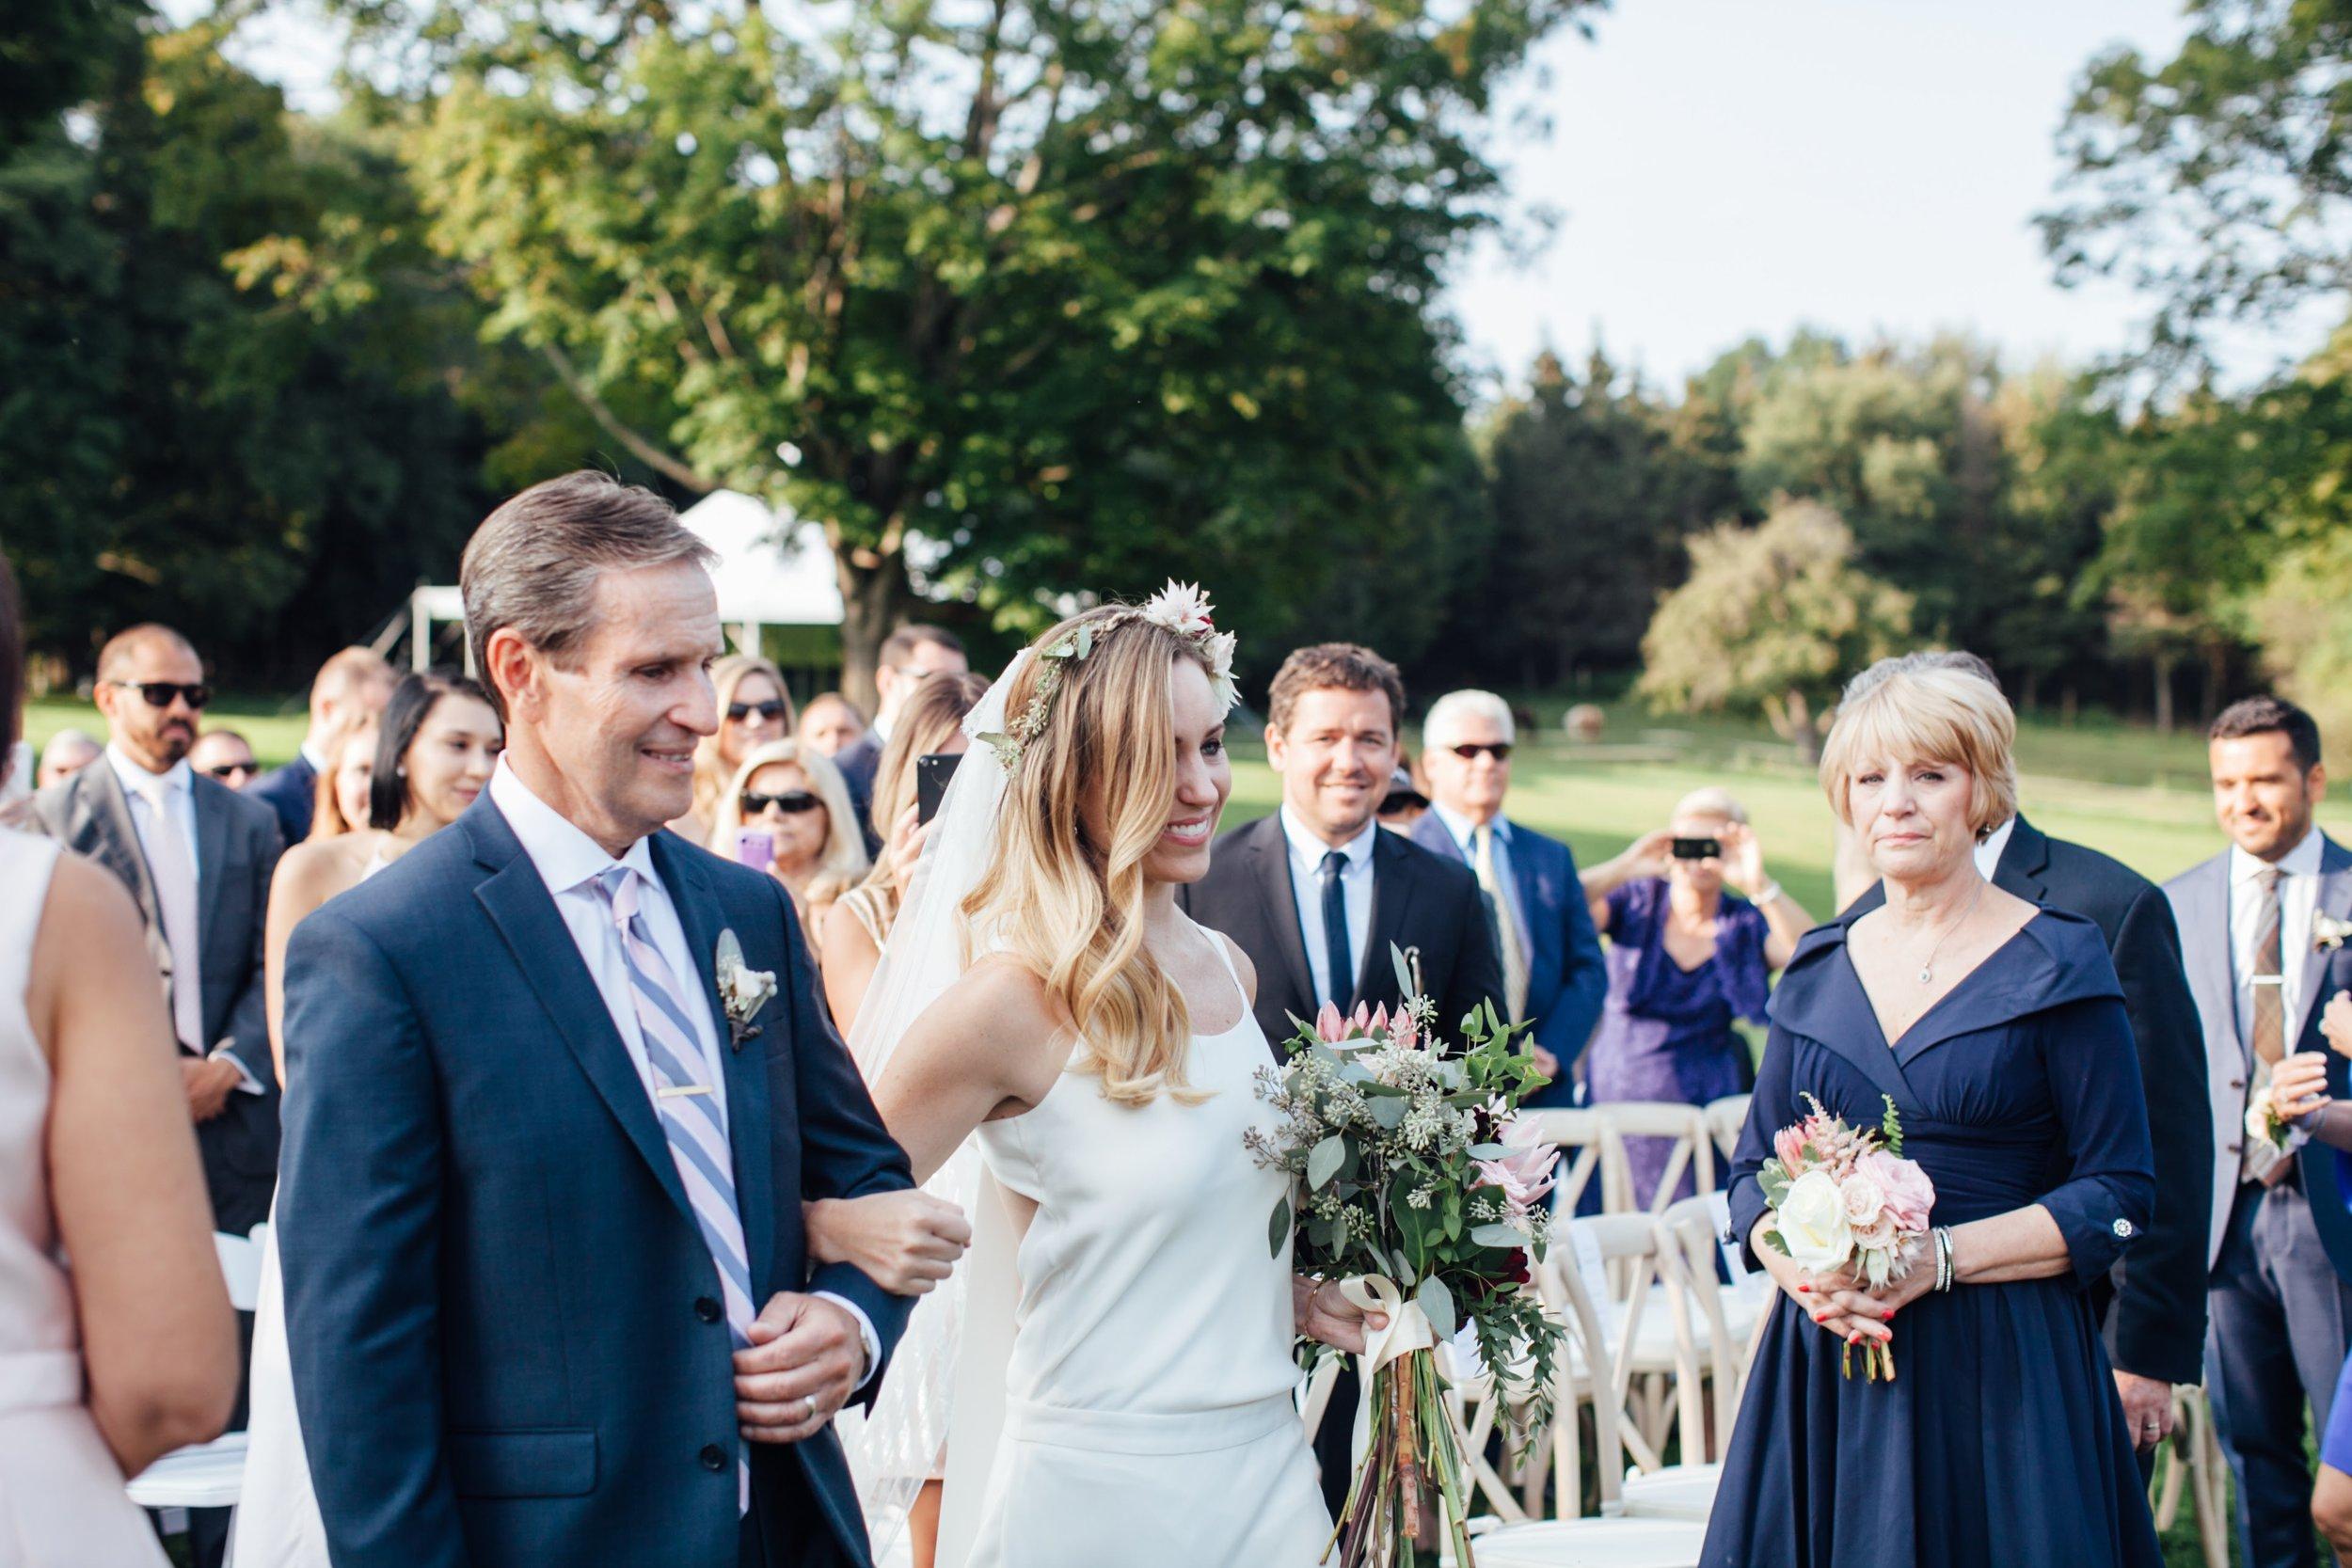 Courtney + Matt Blenheim Hill Farm Catskills NY Wedding Veronica Lola Photography 2017-377.jpg